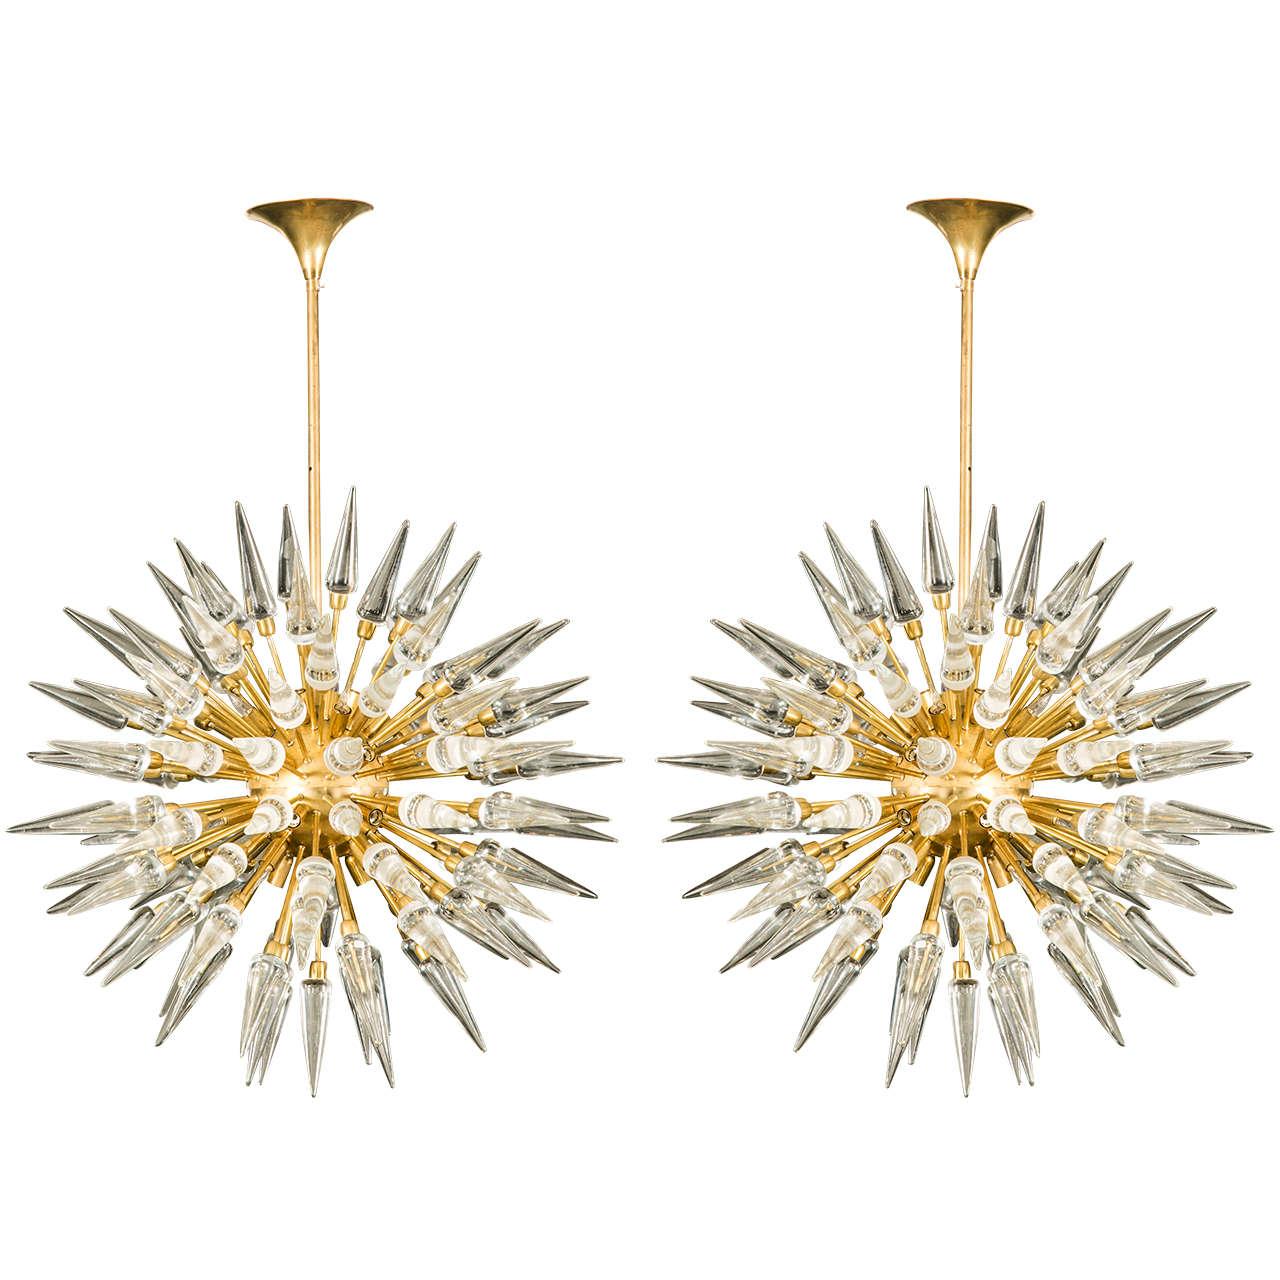 Exceptional sputnik chandeliers for sale at 1stdibs for Sputnik chandelier